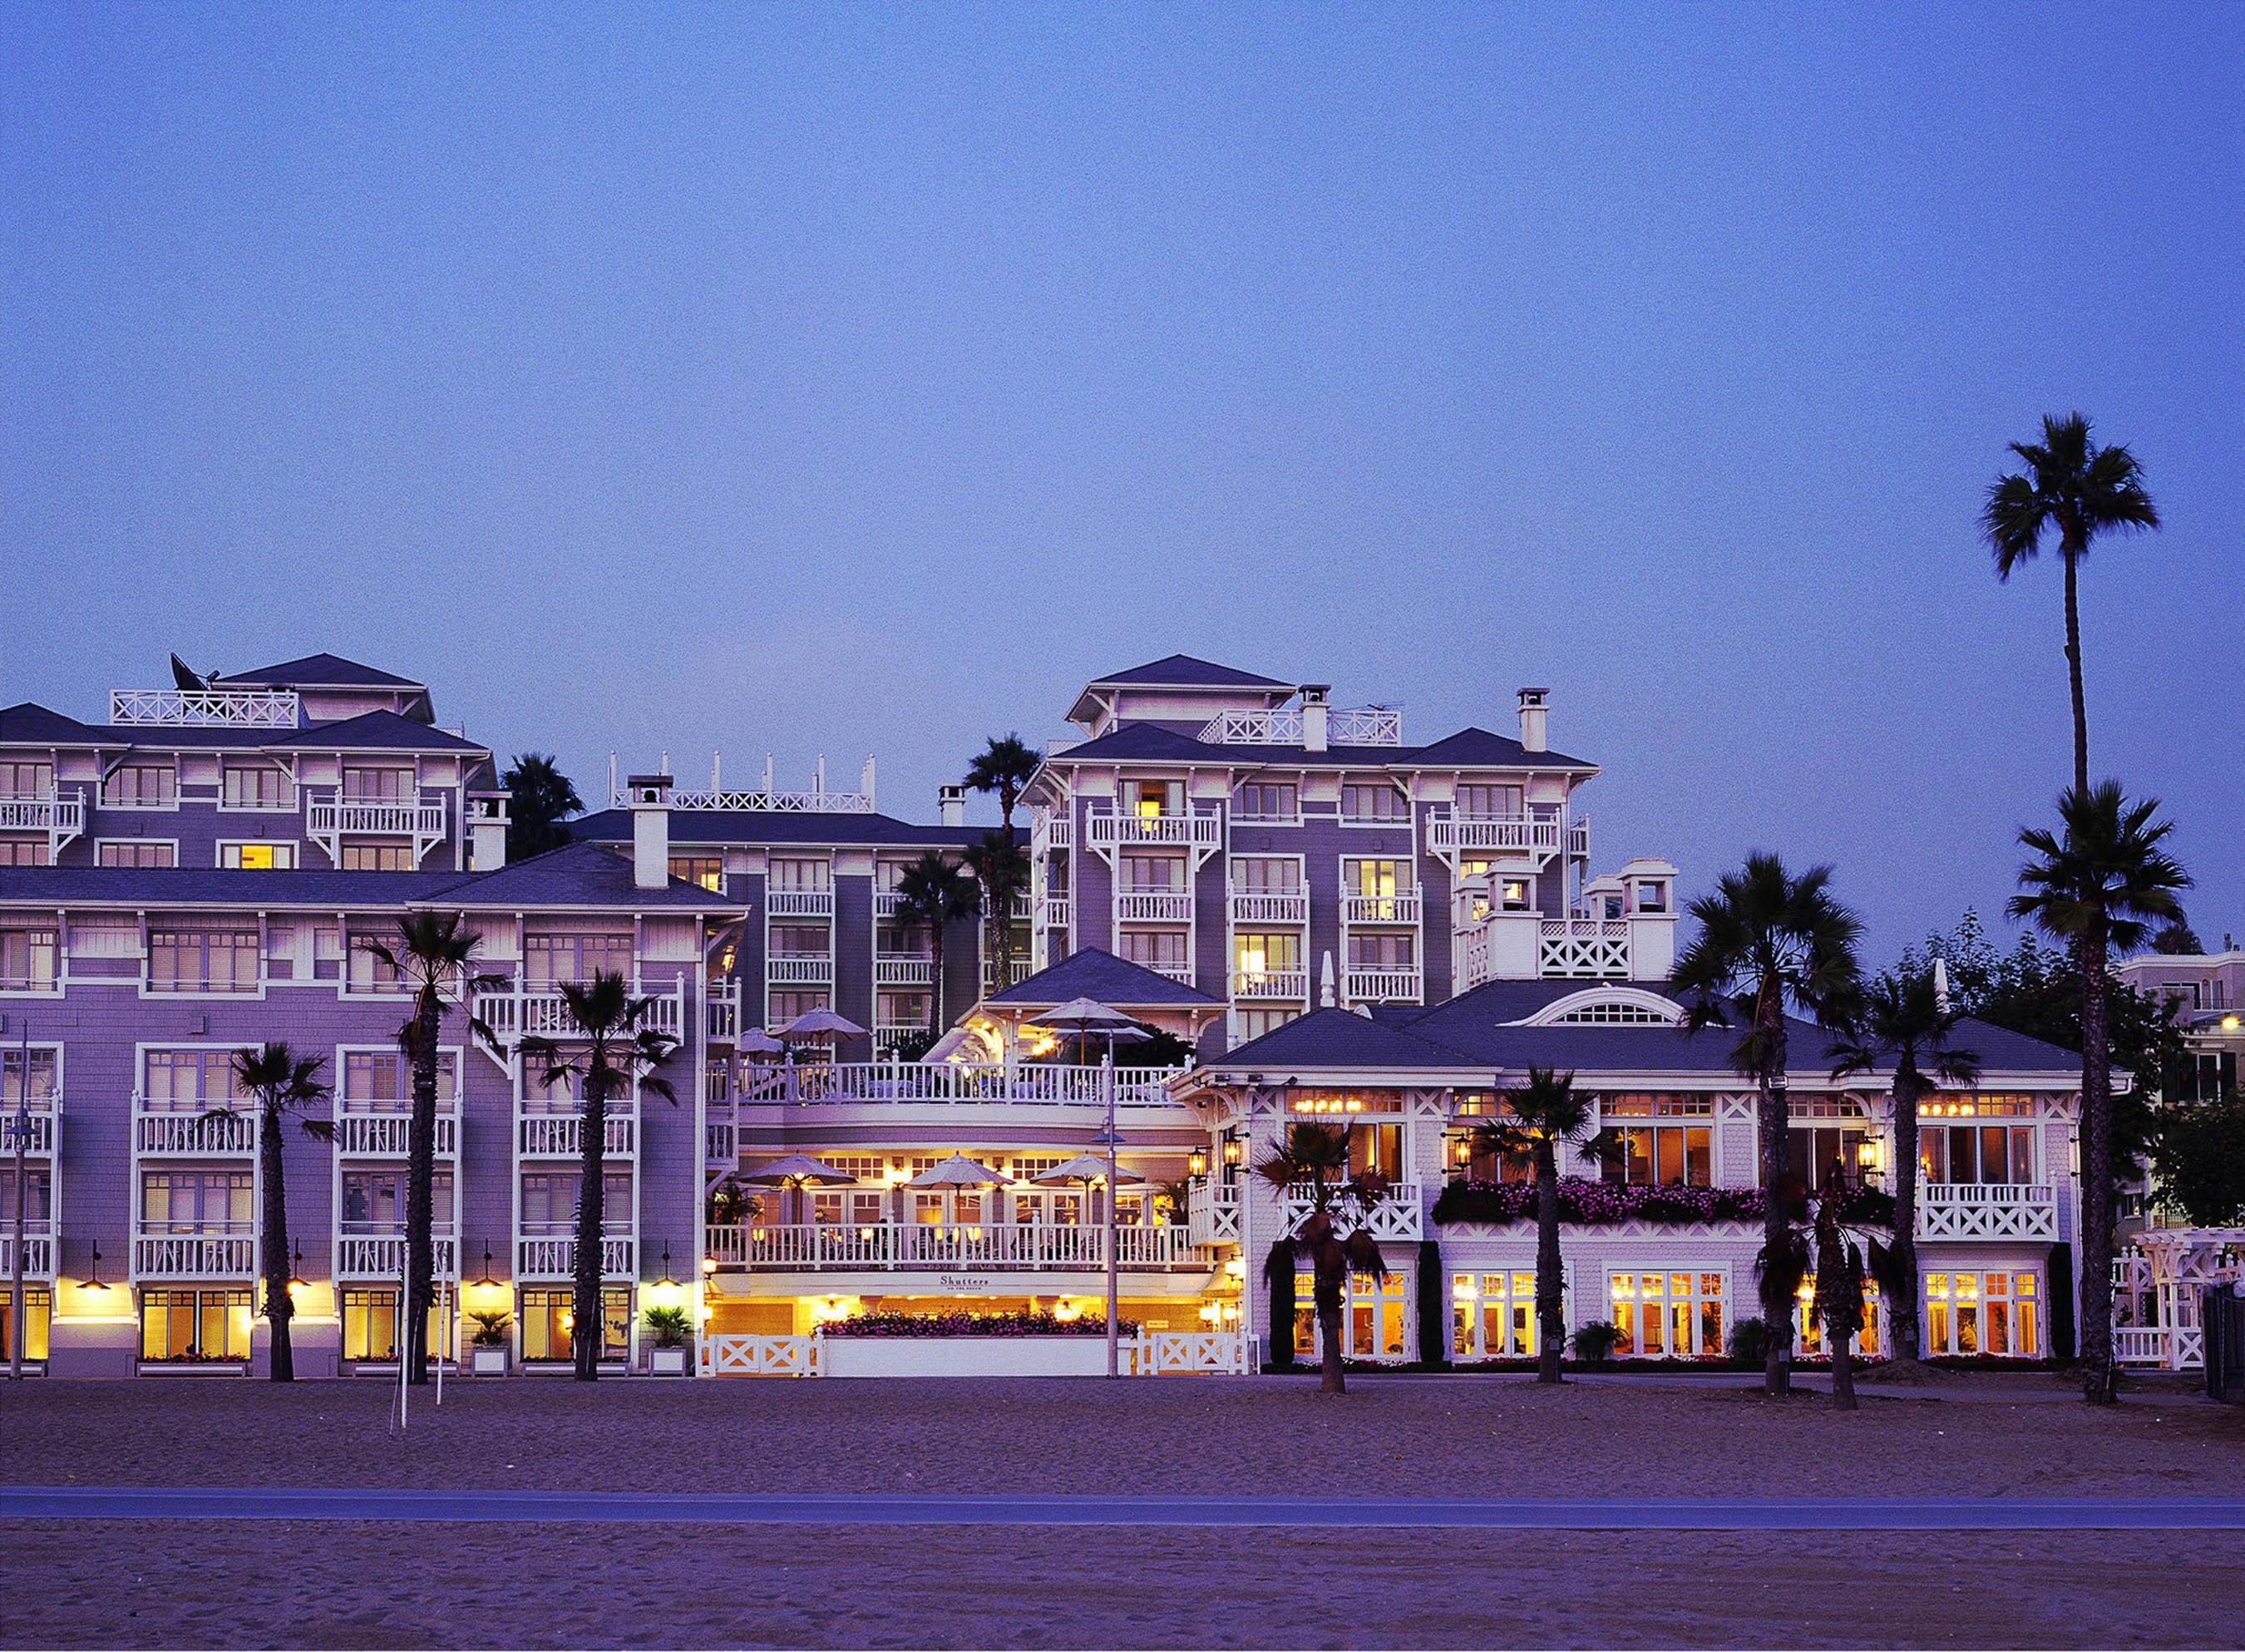 Shutters Hotel, Santa Monica, CA